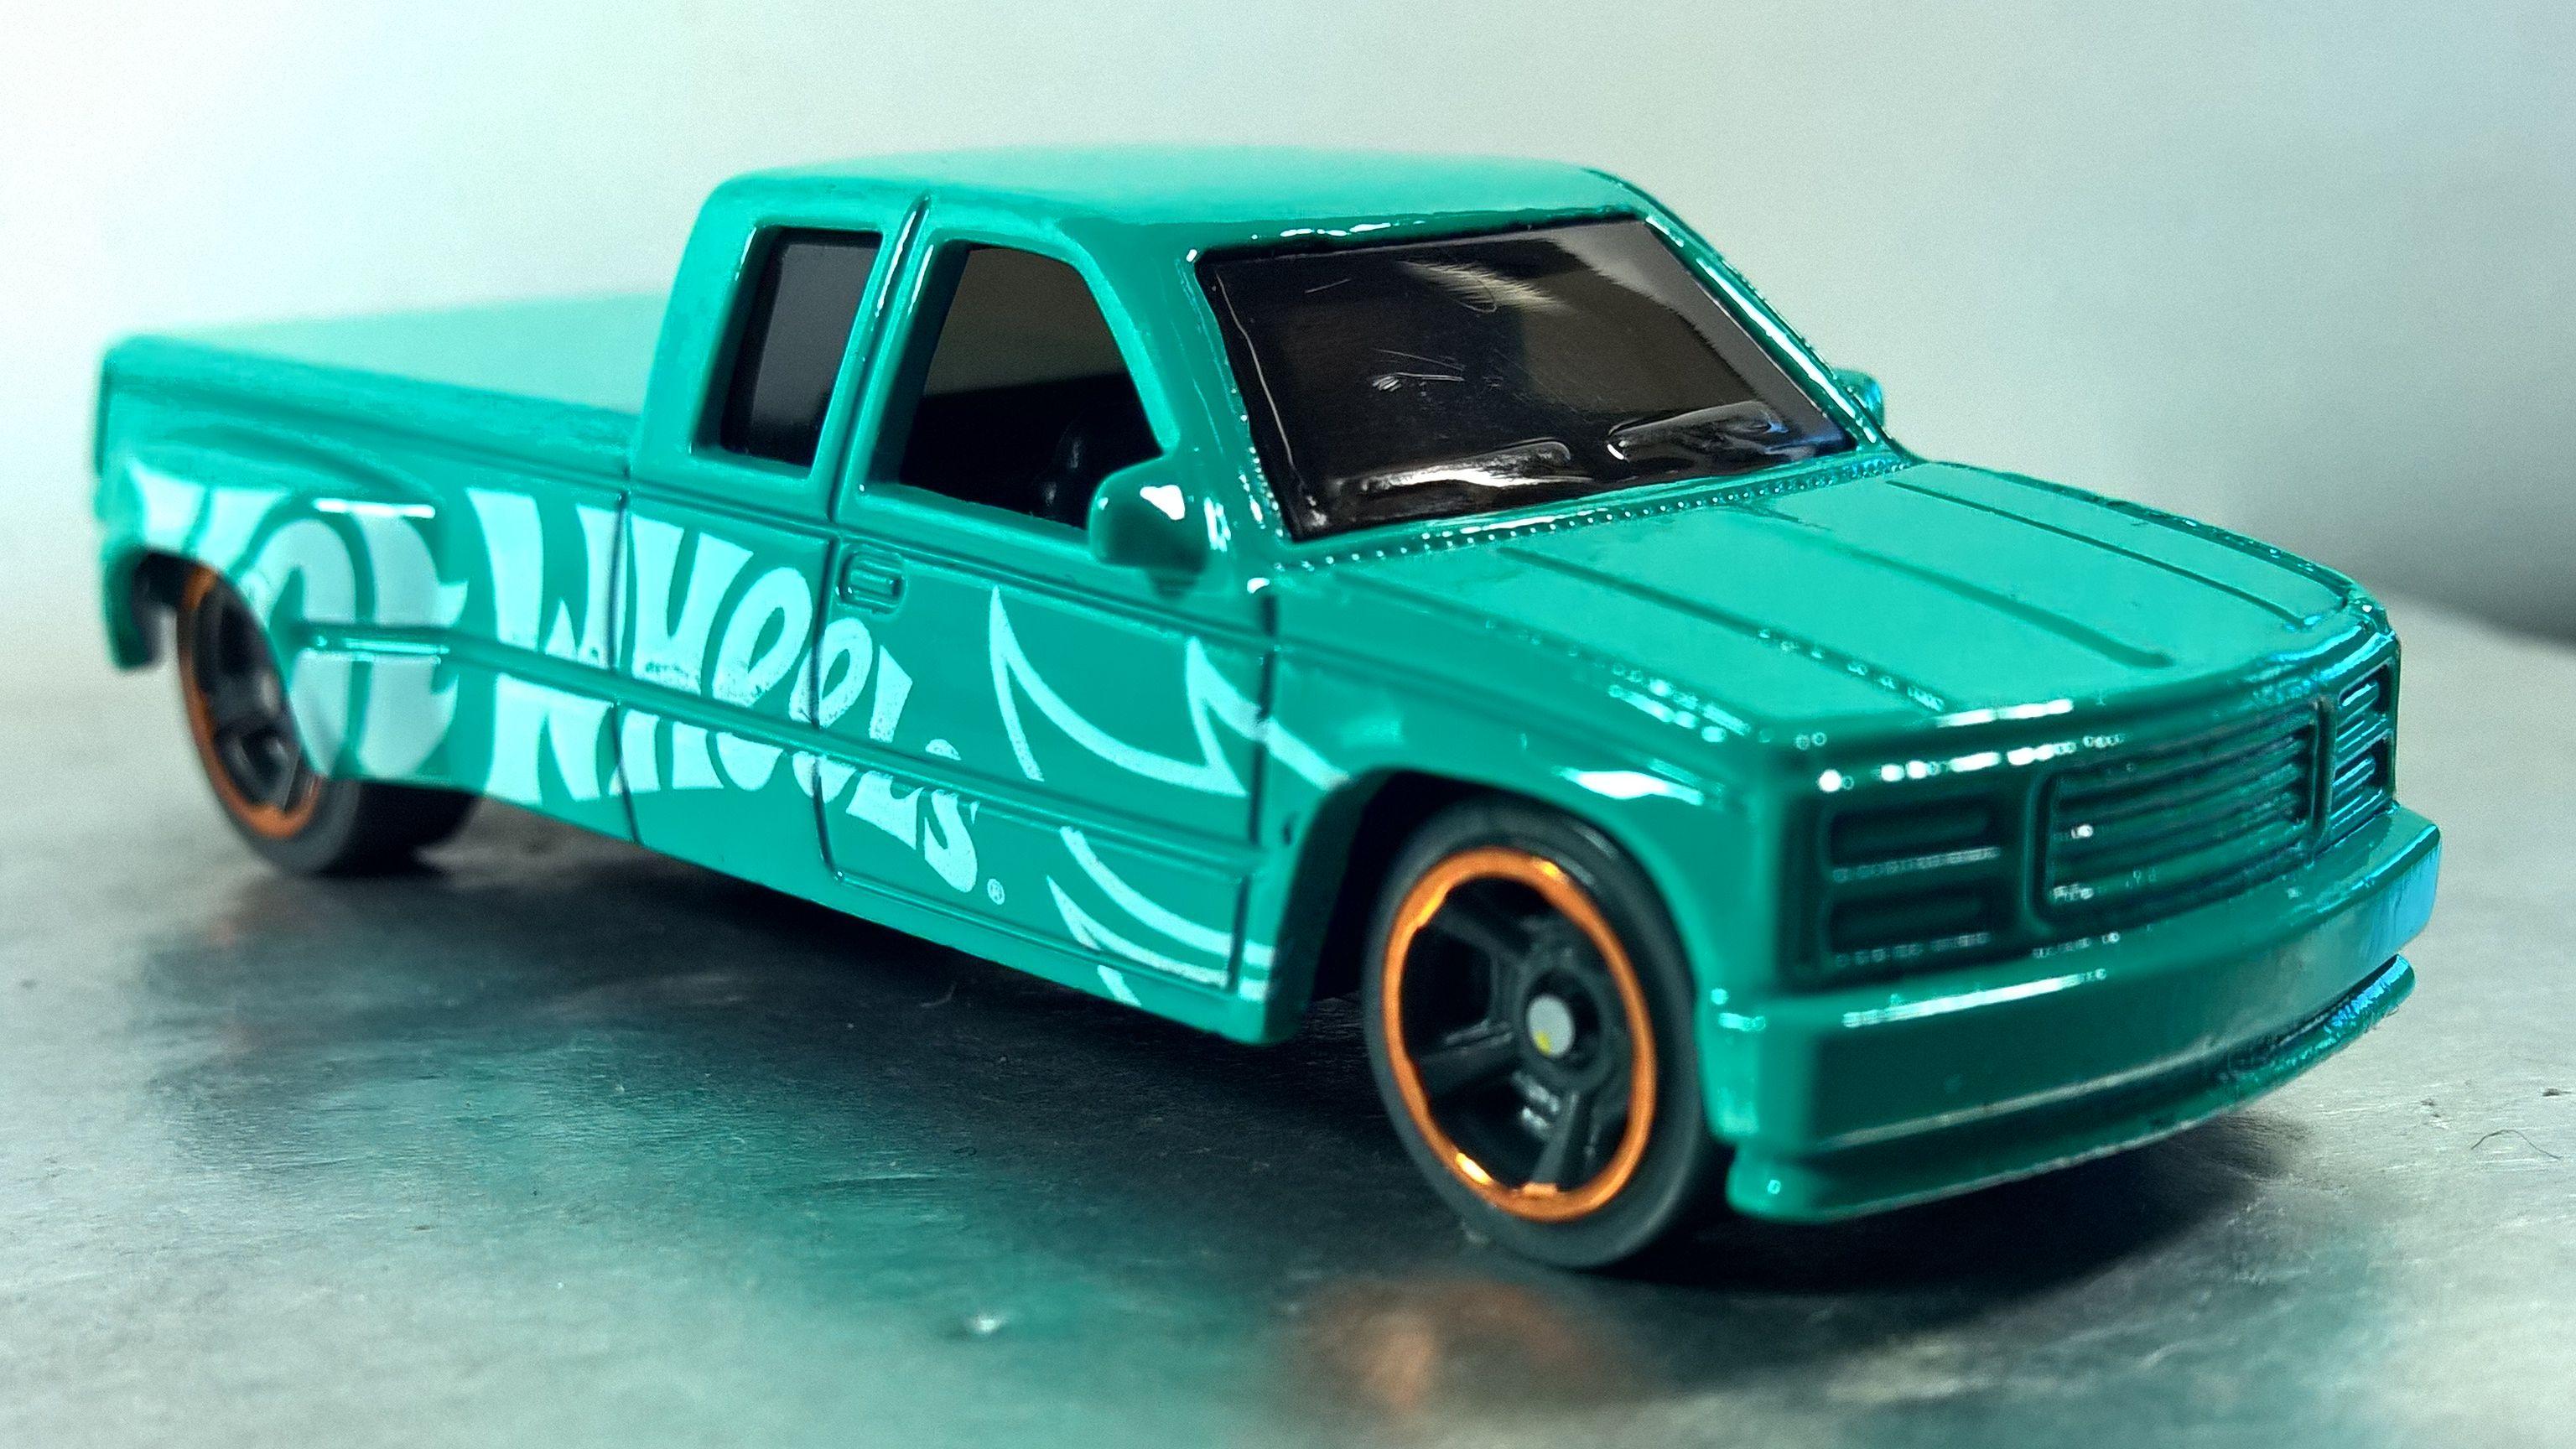 Custom c3500 speed blur 5pack 2019 6 hot wheels toy